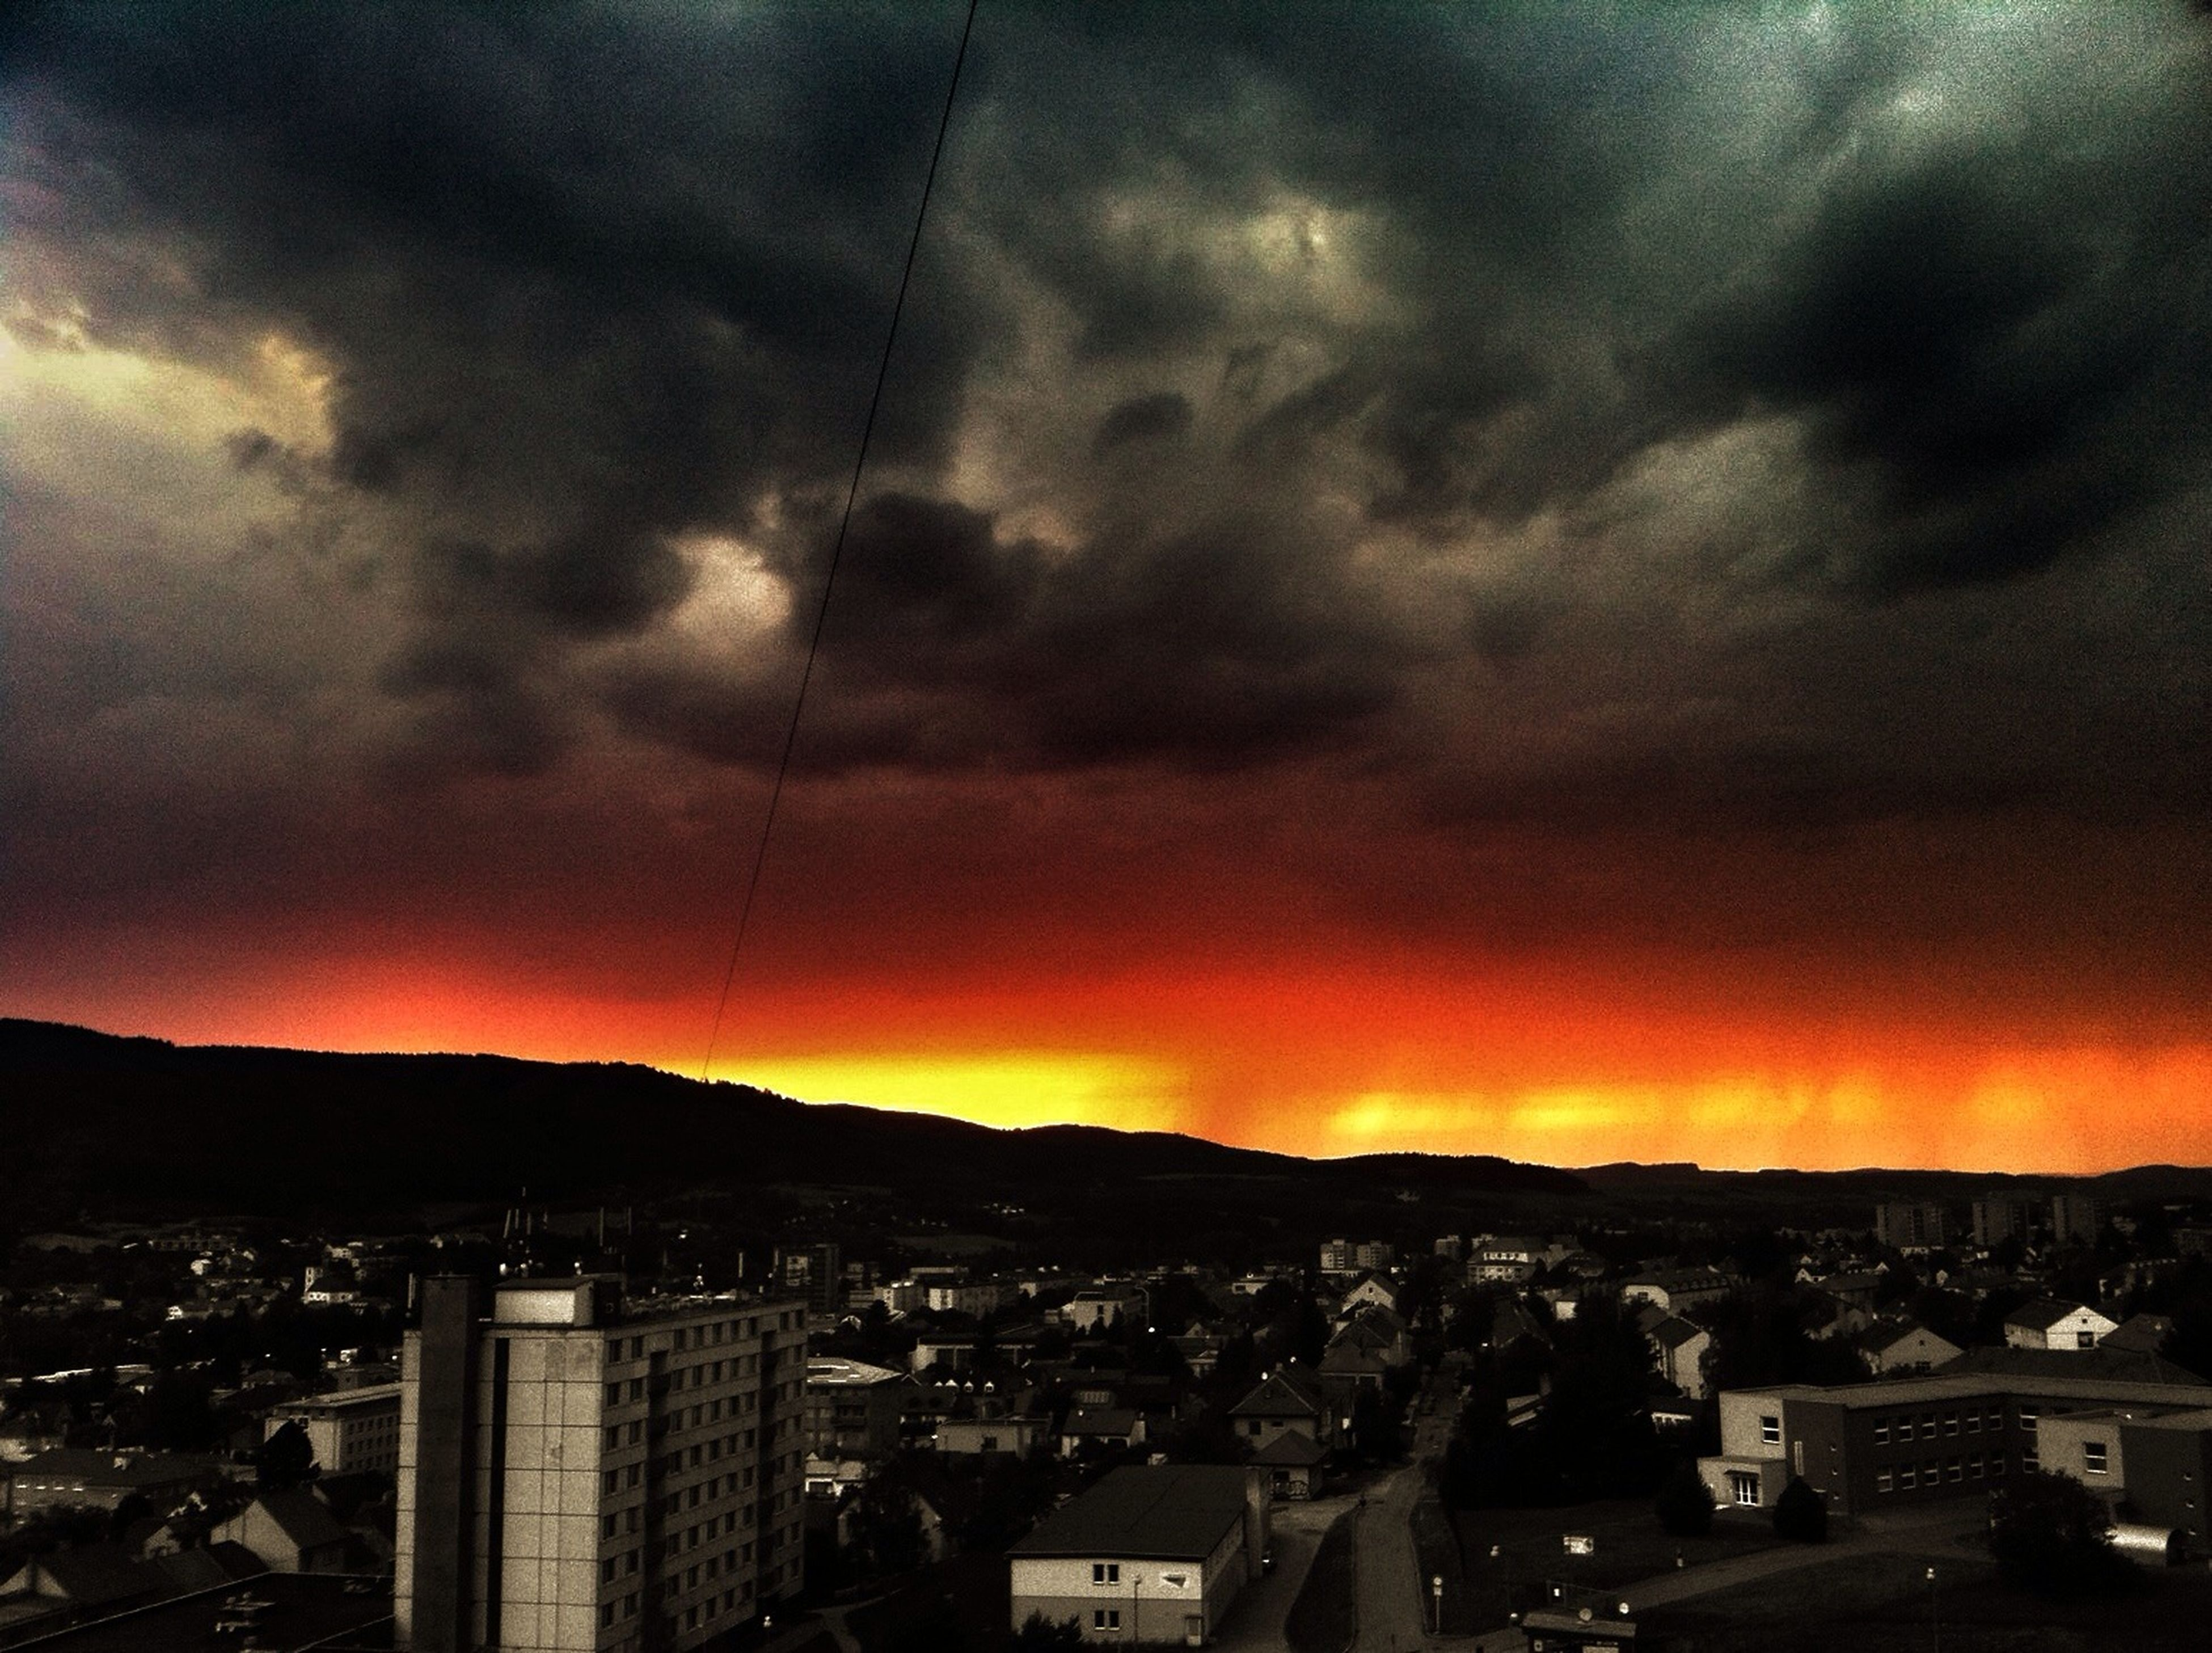 sky, sunset, cityscape, building exterior, cloud - sky, city, architecture, dramatic sky, built structure, cloudy, scenics, orange color, storm cloud, weather, overcast, silhouette, cloud, beauty in nature, dusk, atmospheric mood